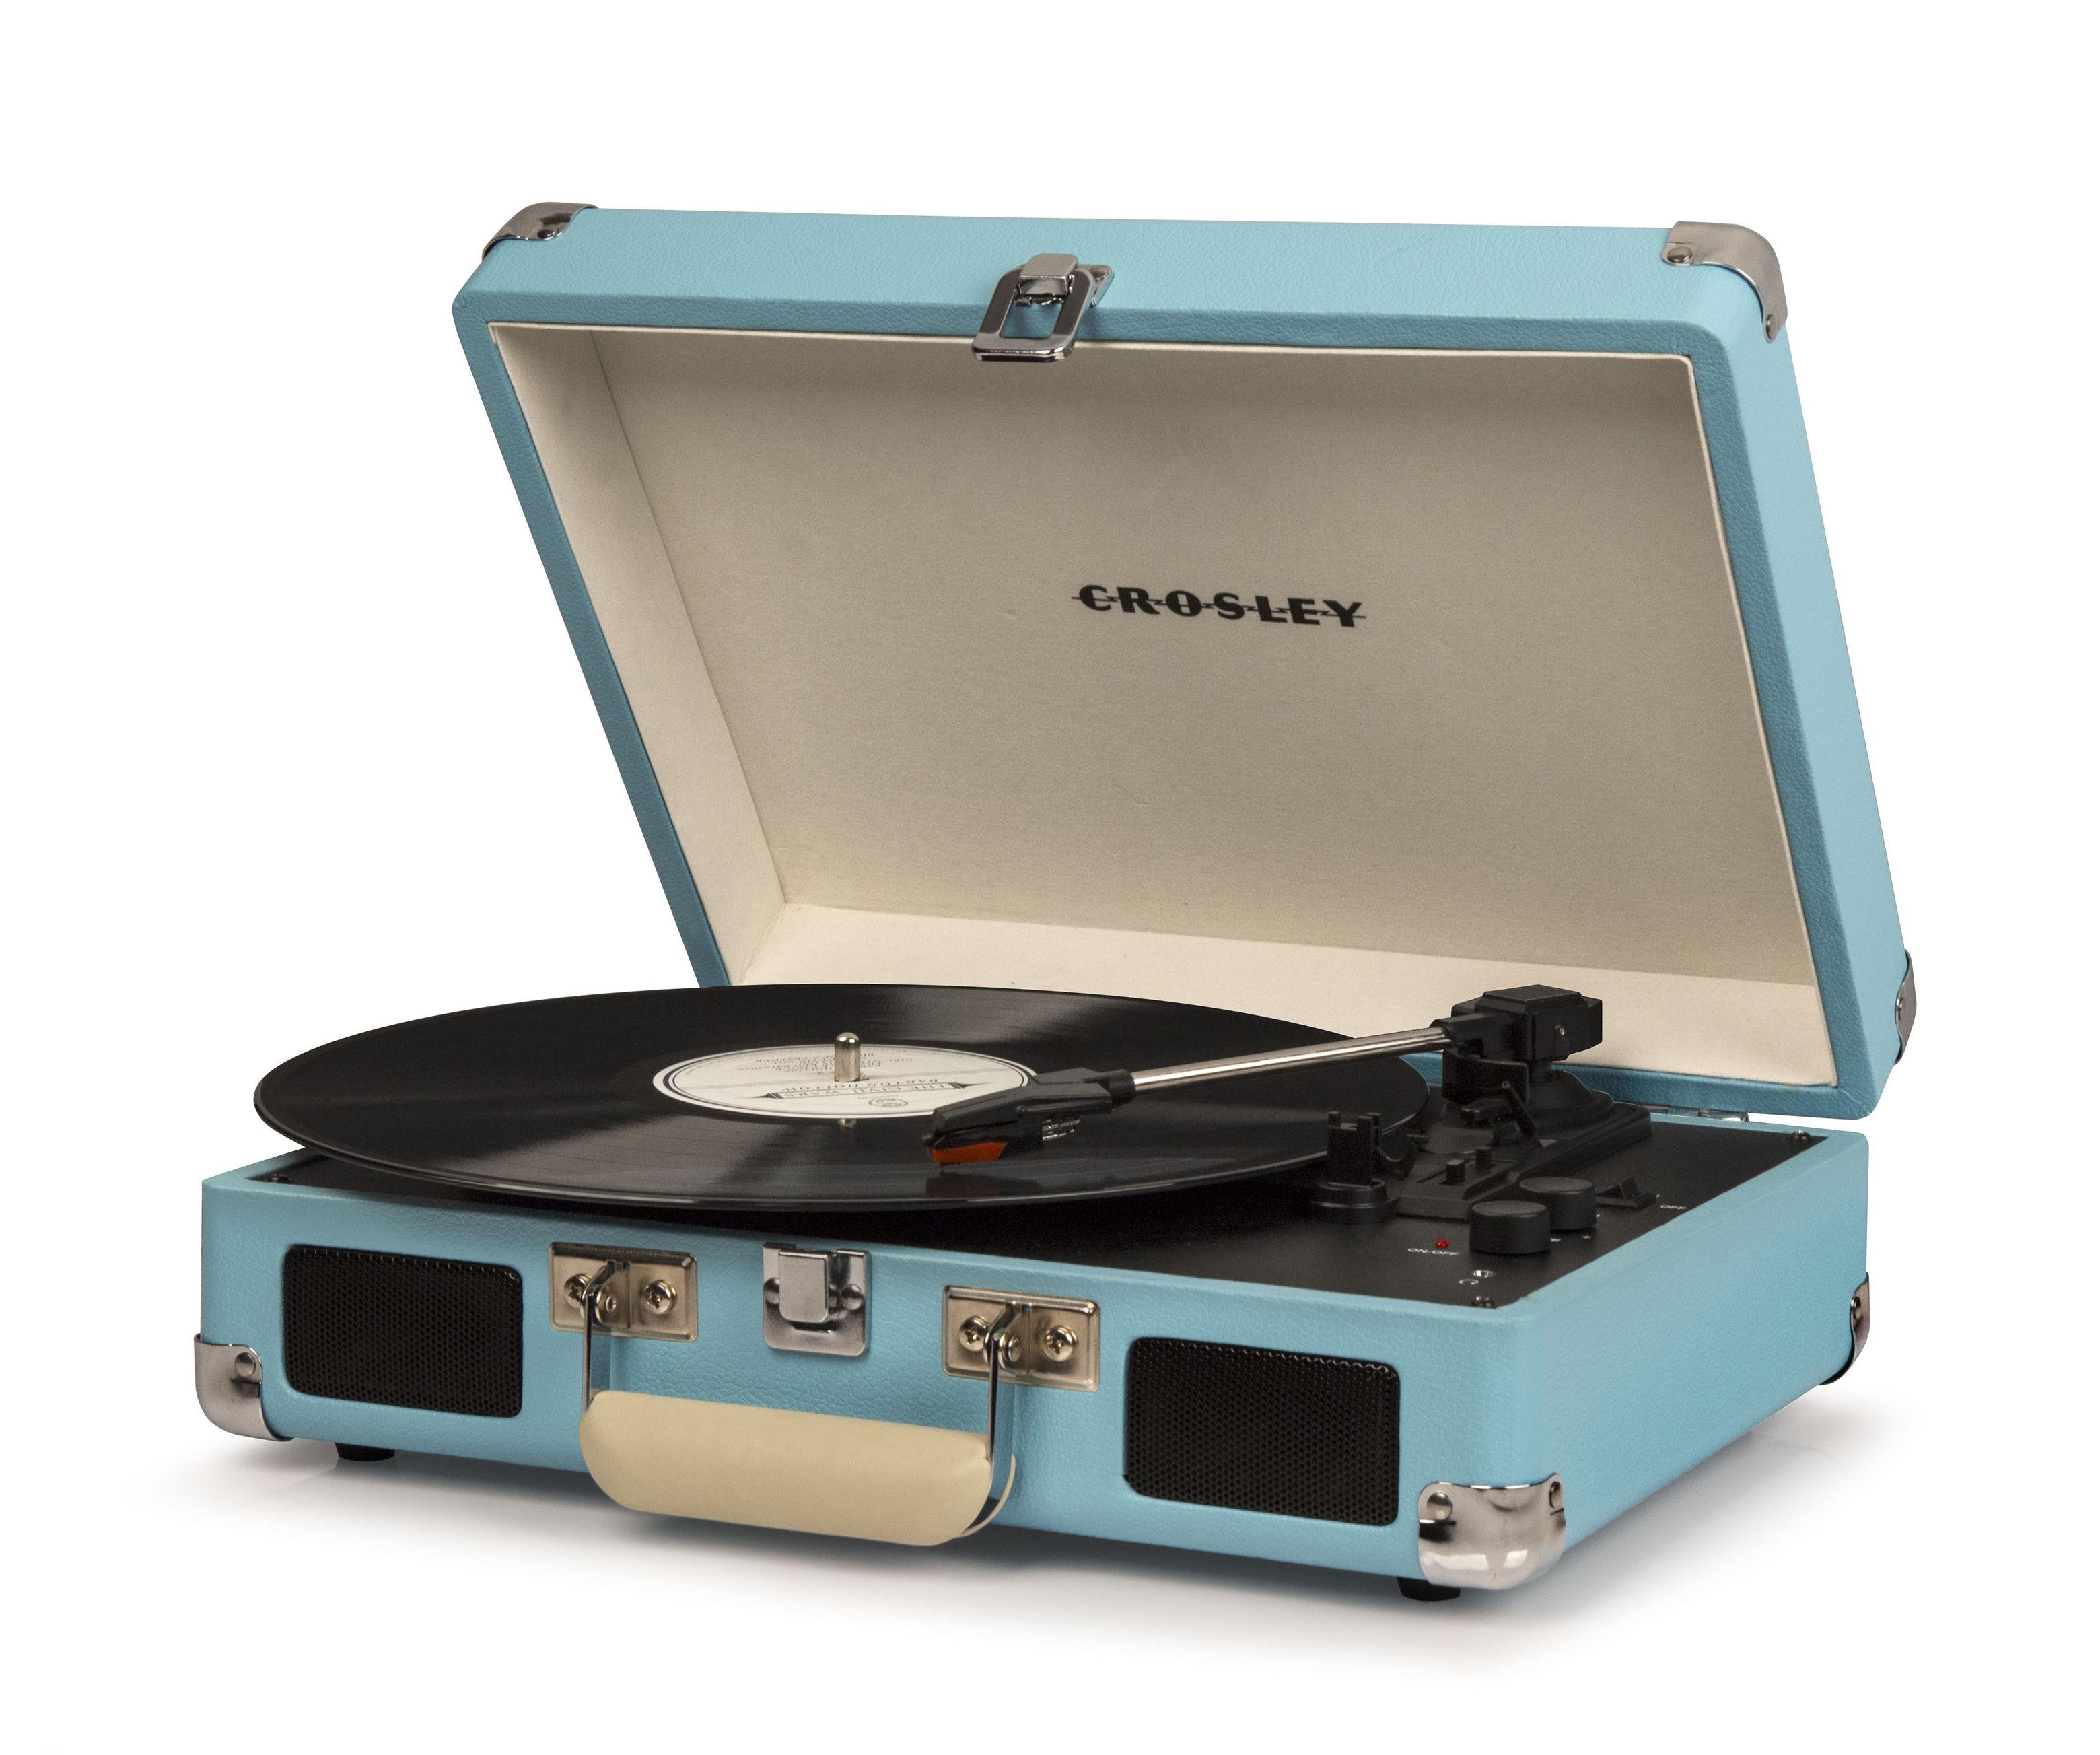 platine vinyle cruiser deluxe portable bluetooth enceintes st r o int gr es turquoise. Black Bedroom Furniture Sets. Home Design Ideas